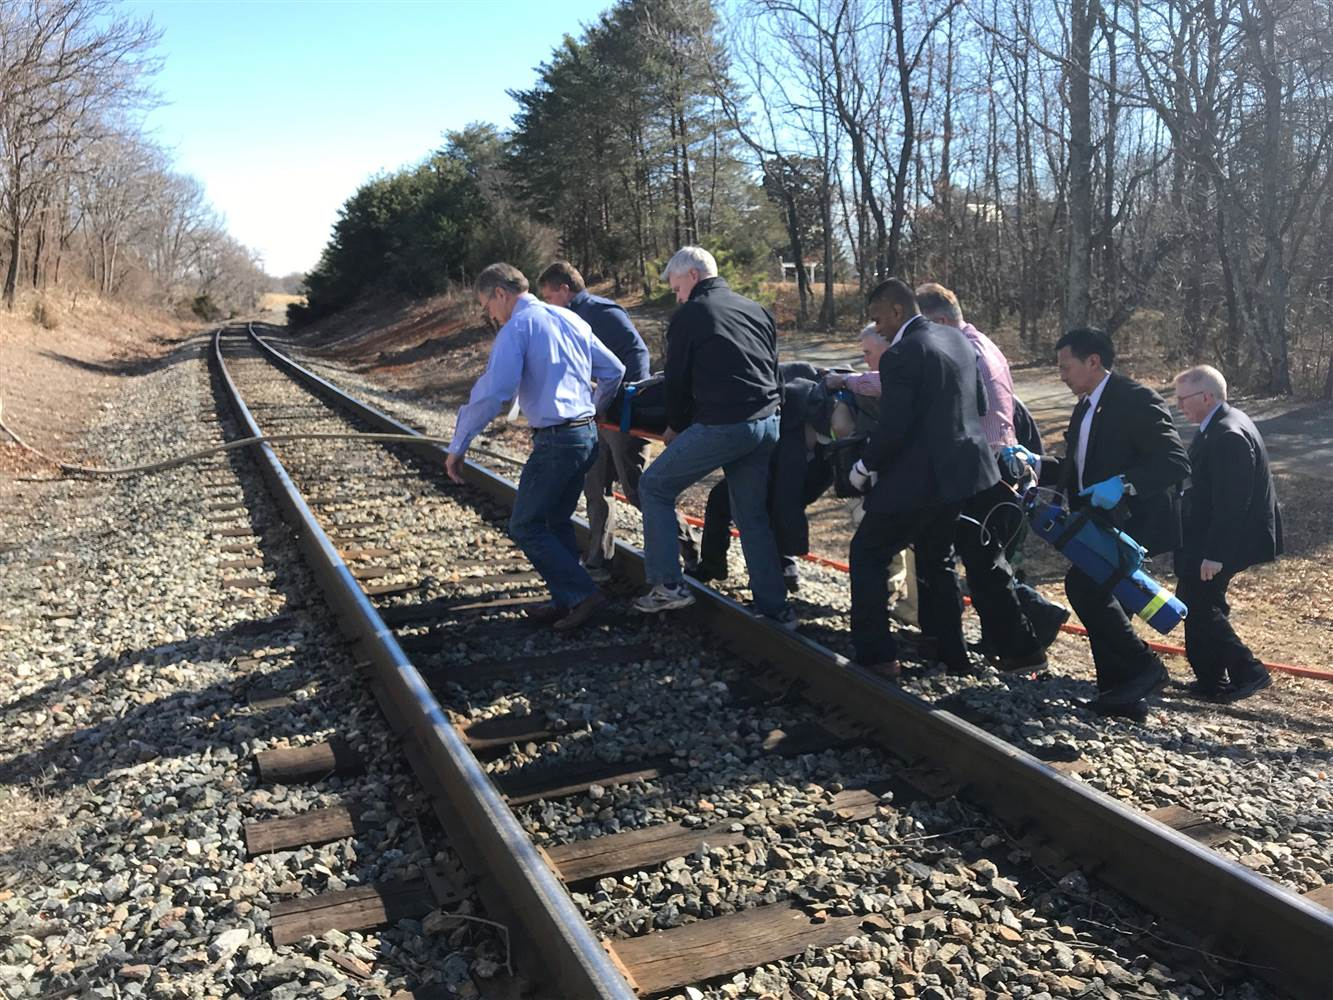 180131-gop-train-crash-injured-passenger-se-129p_72499f9d3f1255bb97f6f5415b13a619.nbcnews-ux-2880-1000